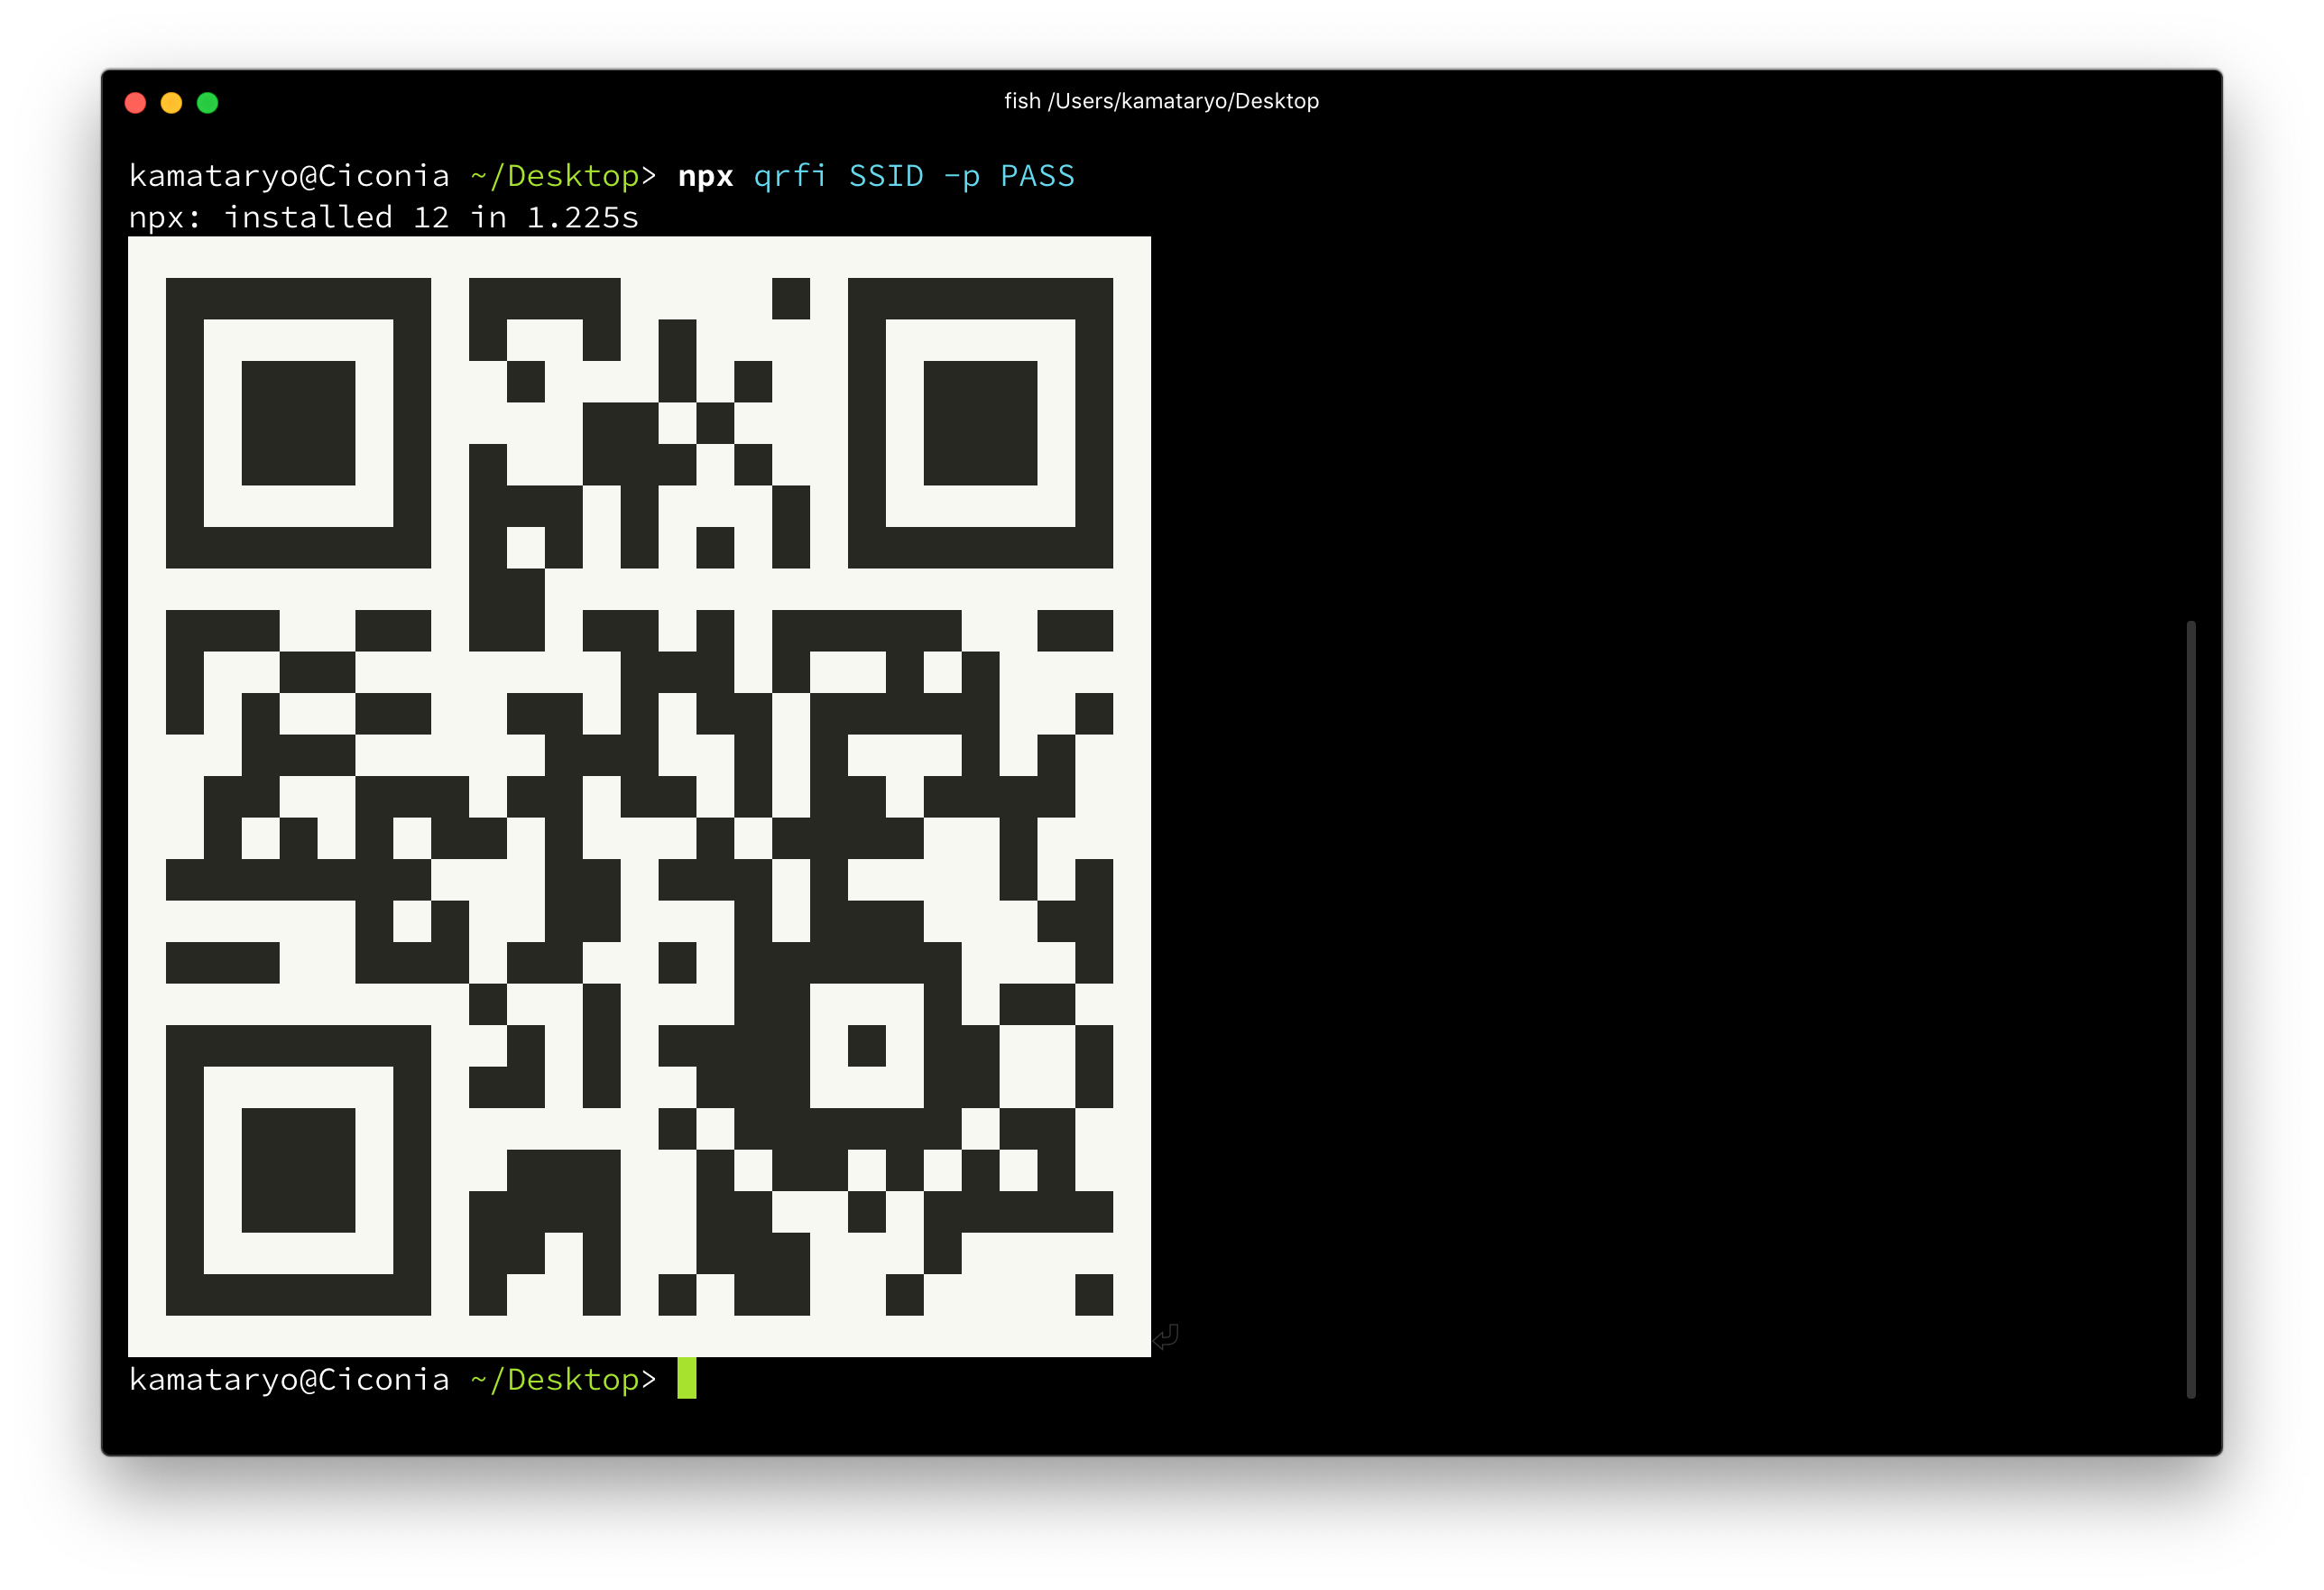 Screenshot 2019-09-02 09.36.51.png